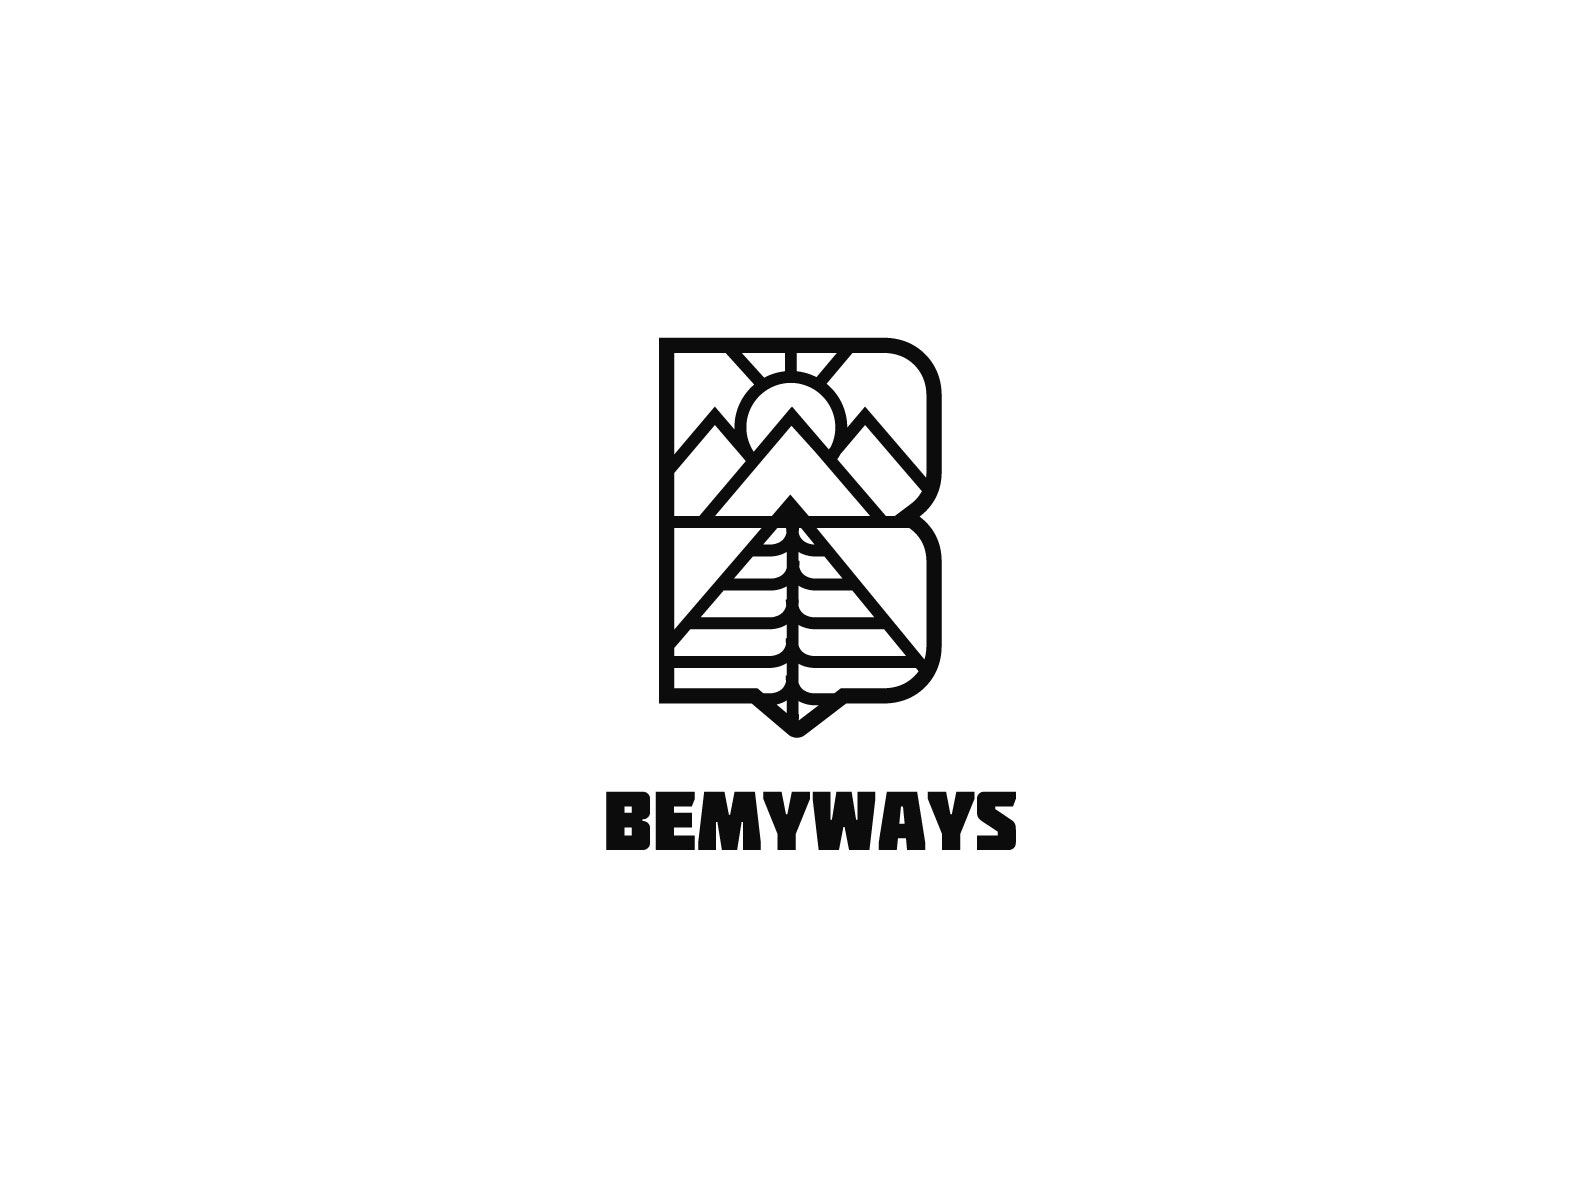 Разработка логотипа и иконки для Travel Video Platform фото f_5895c3975e3035b2.jpg